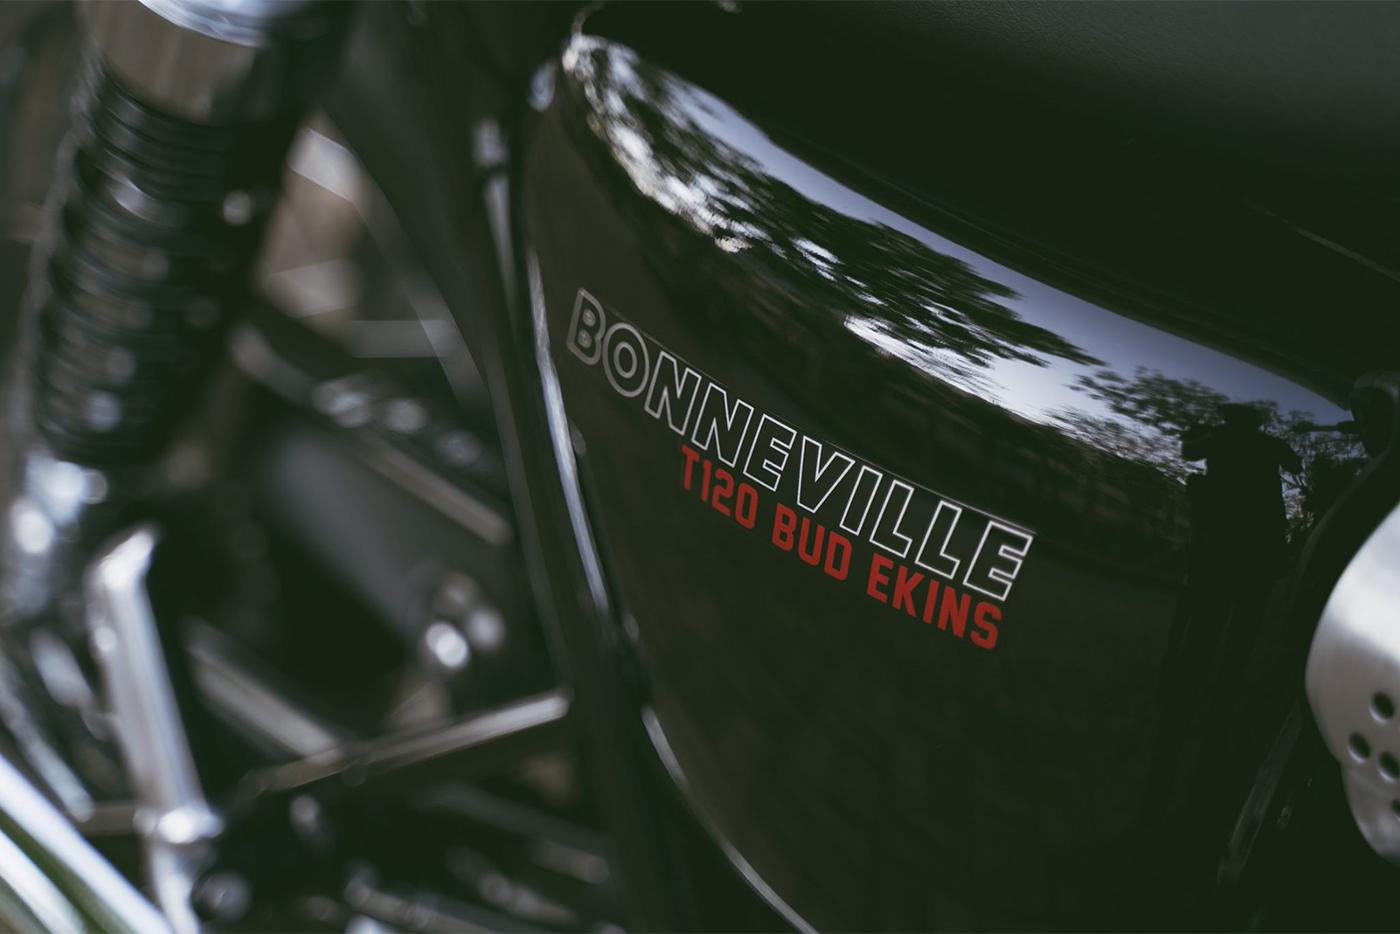 bonneville-bud-ekins-t100-1.jpg